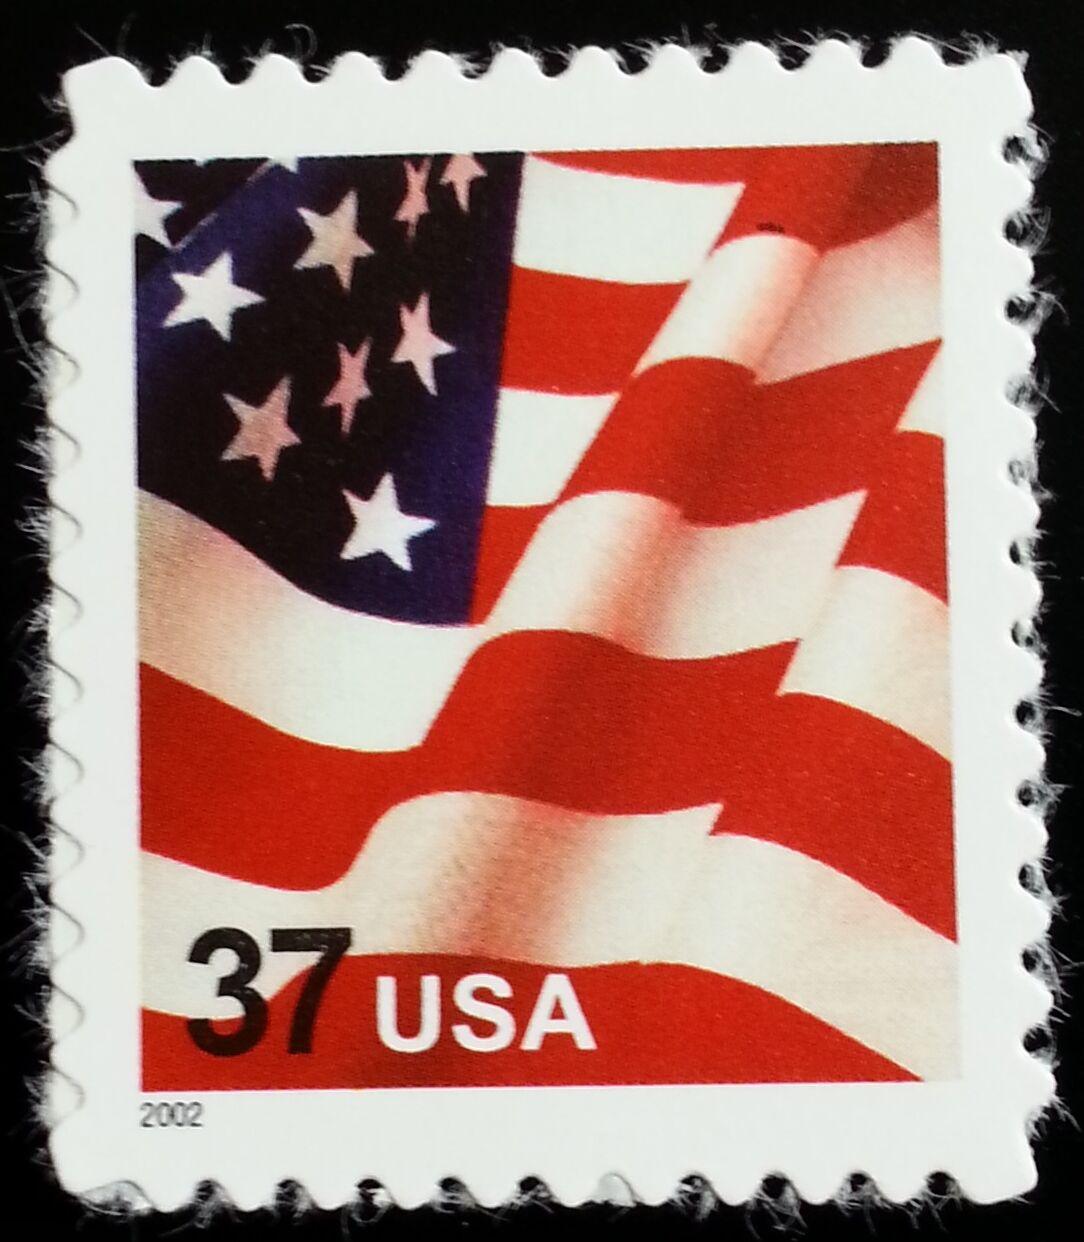 2002 37c Denominated American Flag, SA Scott 3630 Mint